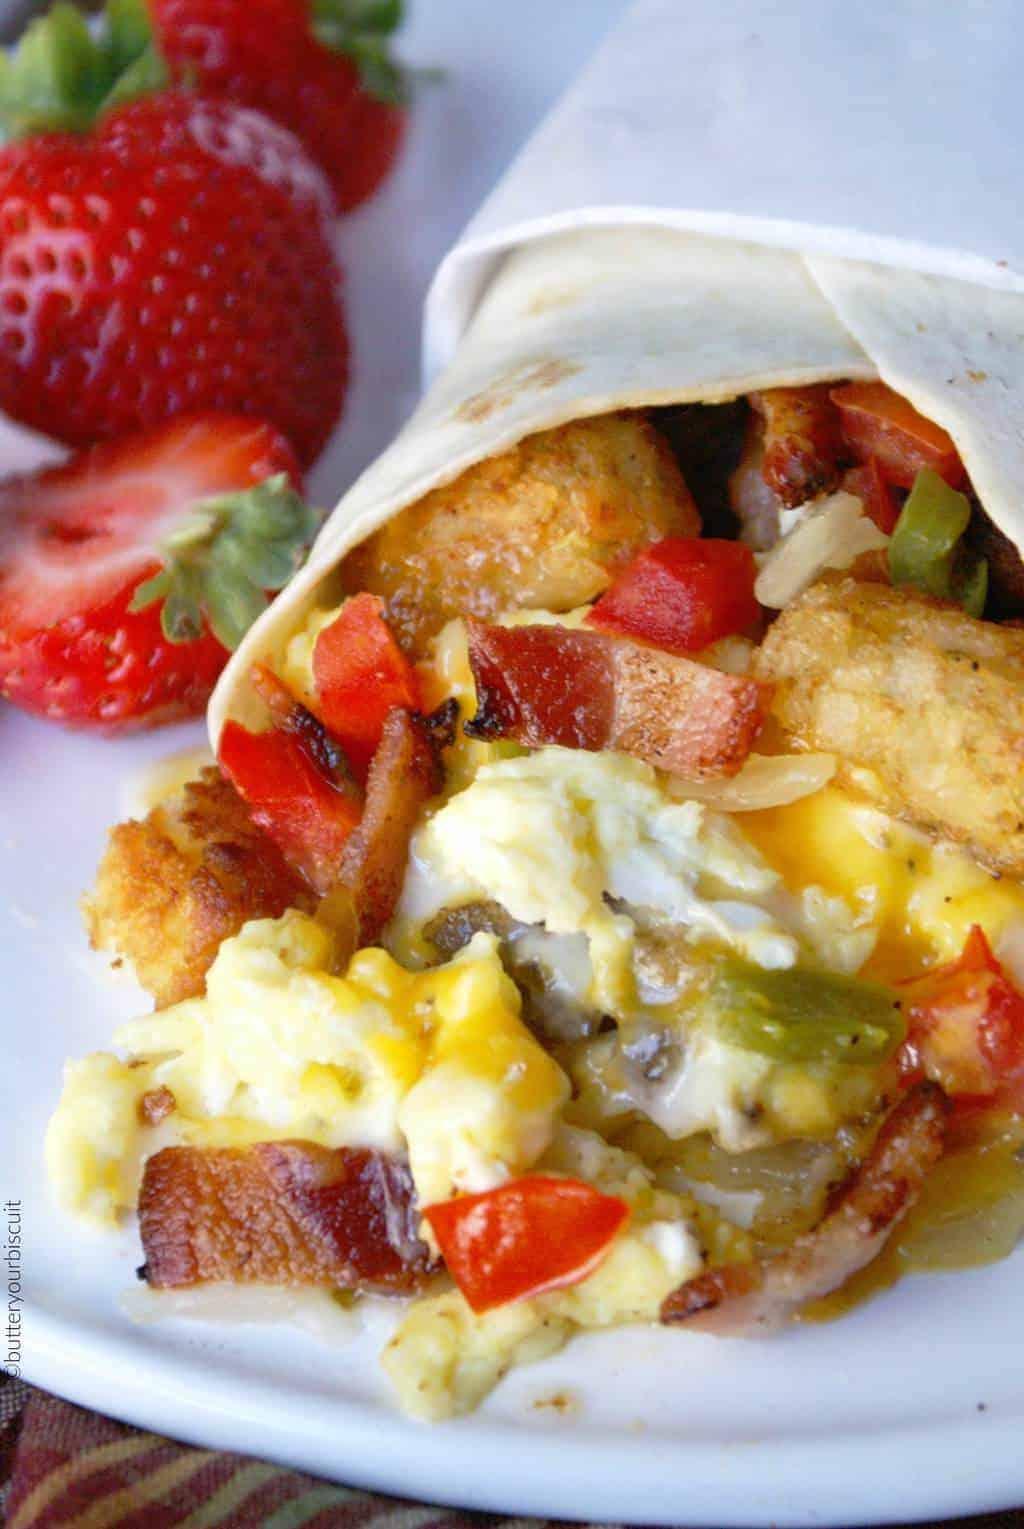 Breakfast Burrito Recipe {Freezer Friendly} - Butter Your